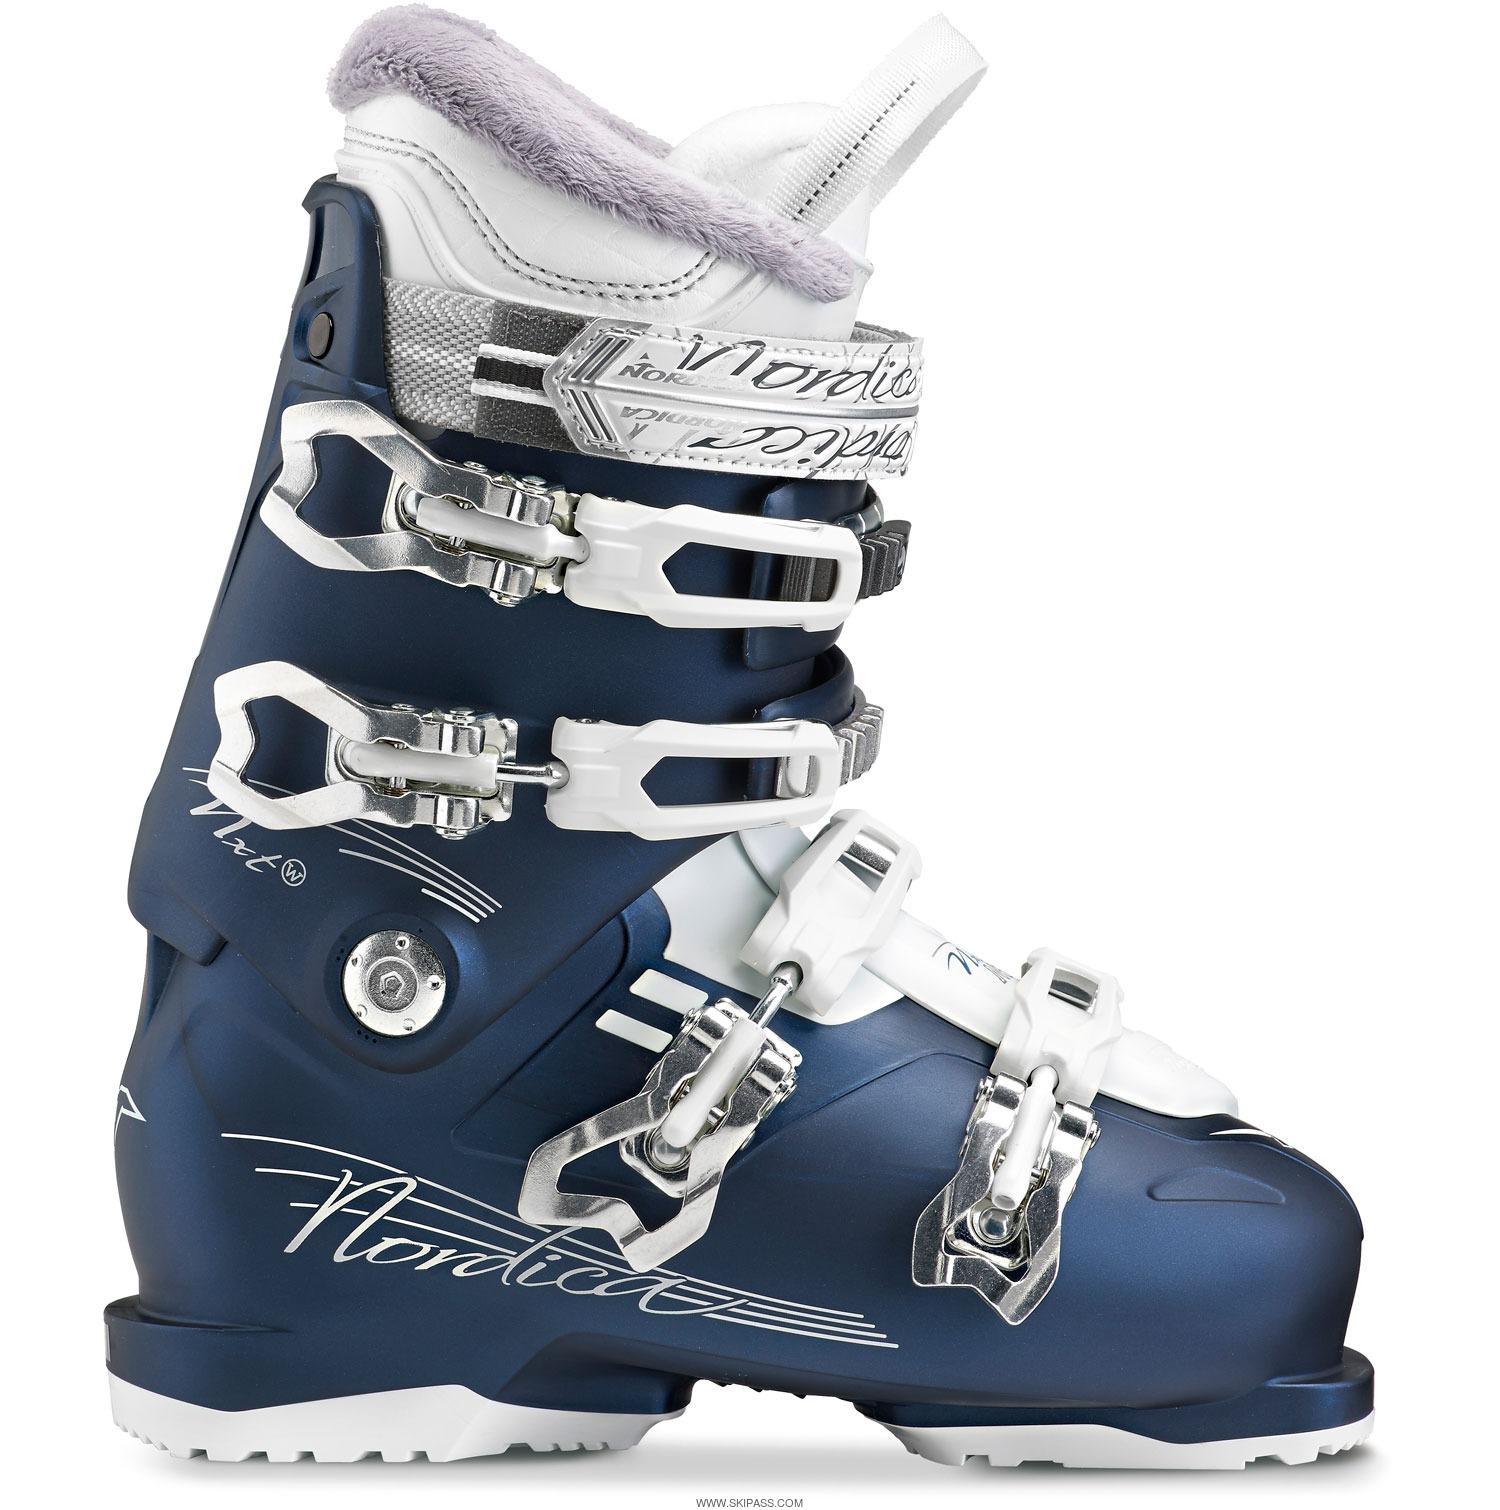 Nordica Nxt N5 W Chaussure Ski Femme  - Chaussures Ski Femme